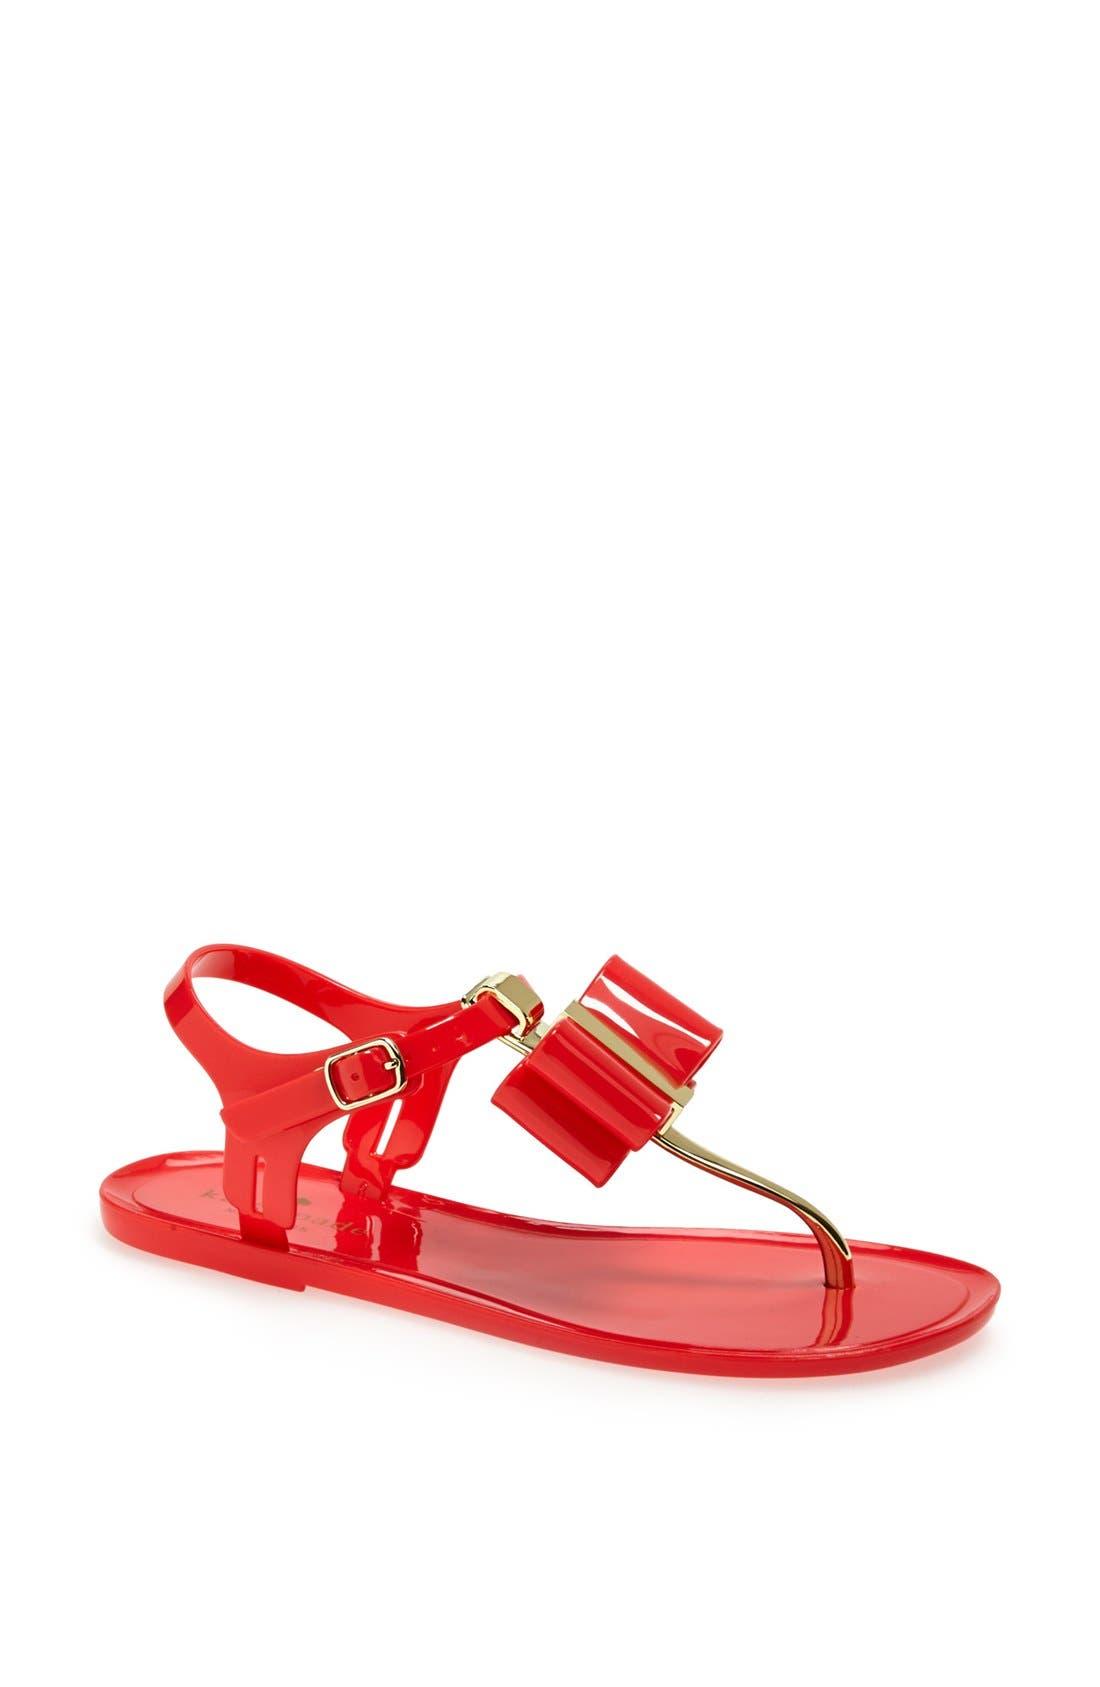 Alternate Image 1 Selected - kate spade new york 'filo' jelly sandal